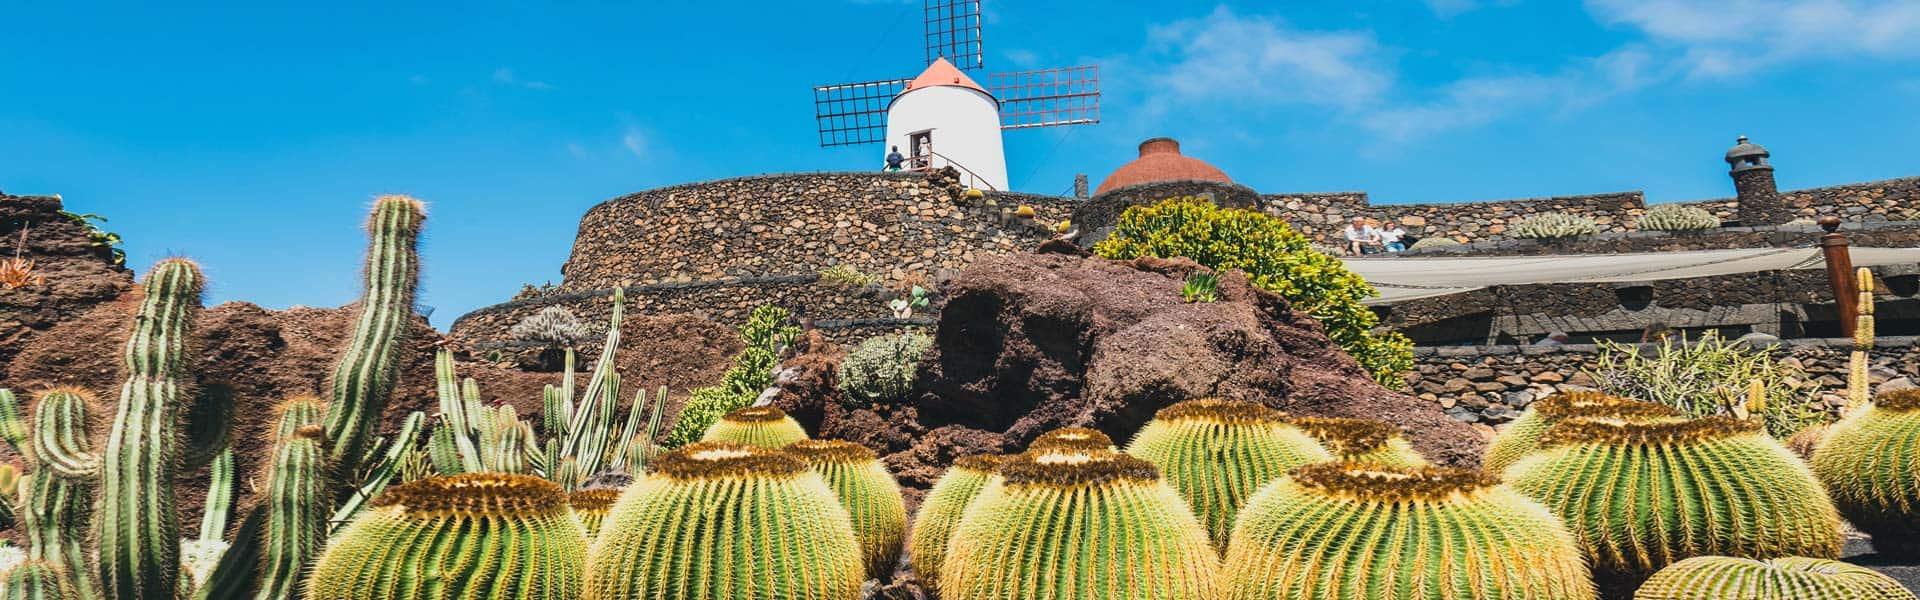 Kakteengarten Jardin de Cactus, Lanzarote – Werk des lanzerotenischen Künstlers César Manrique